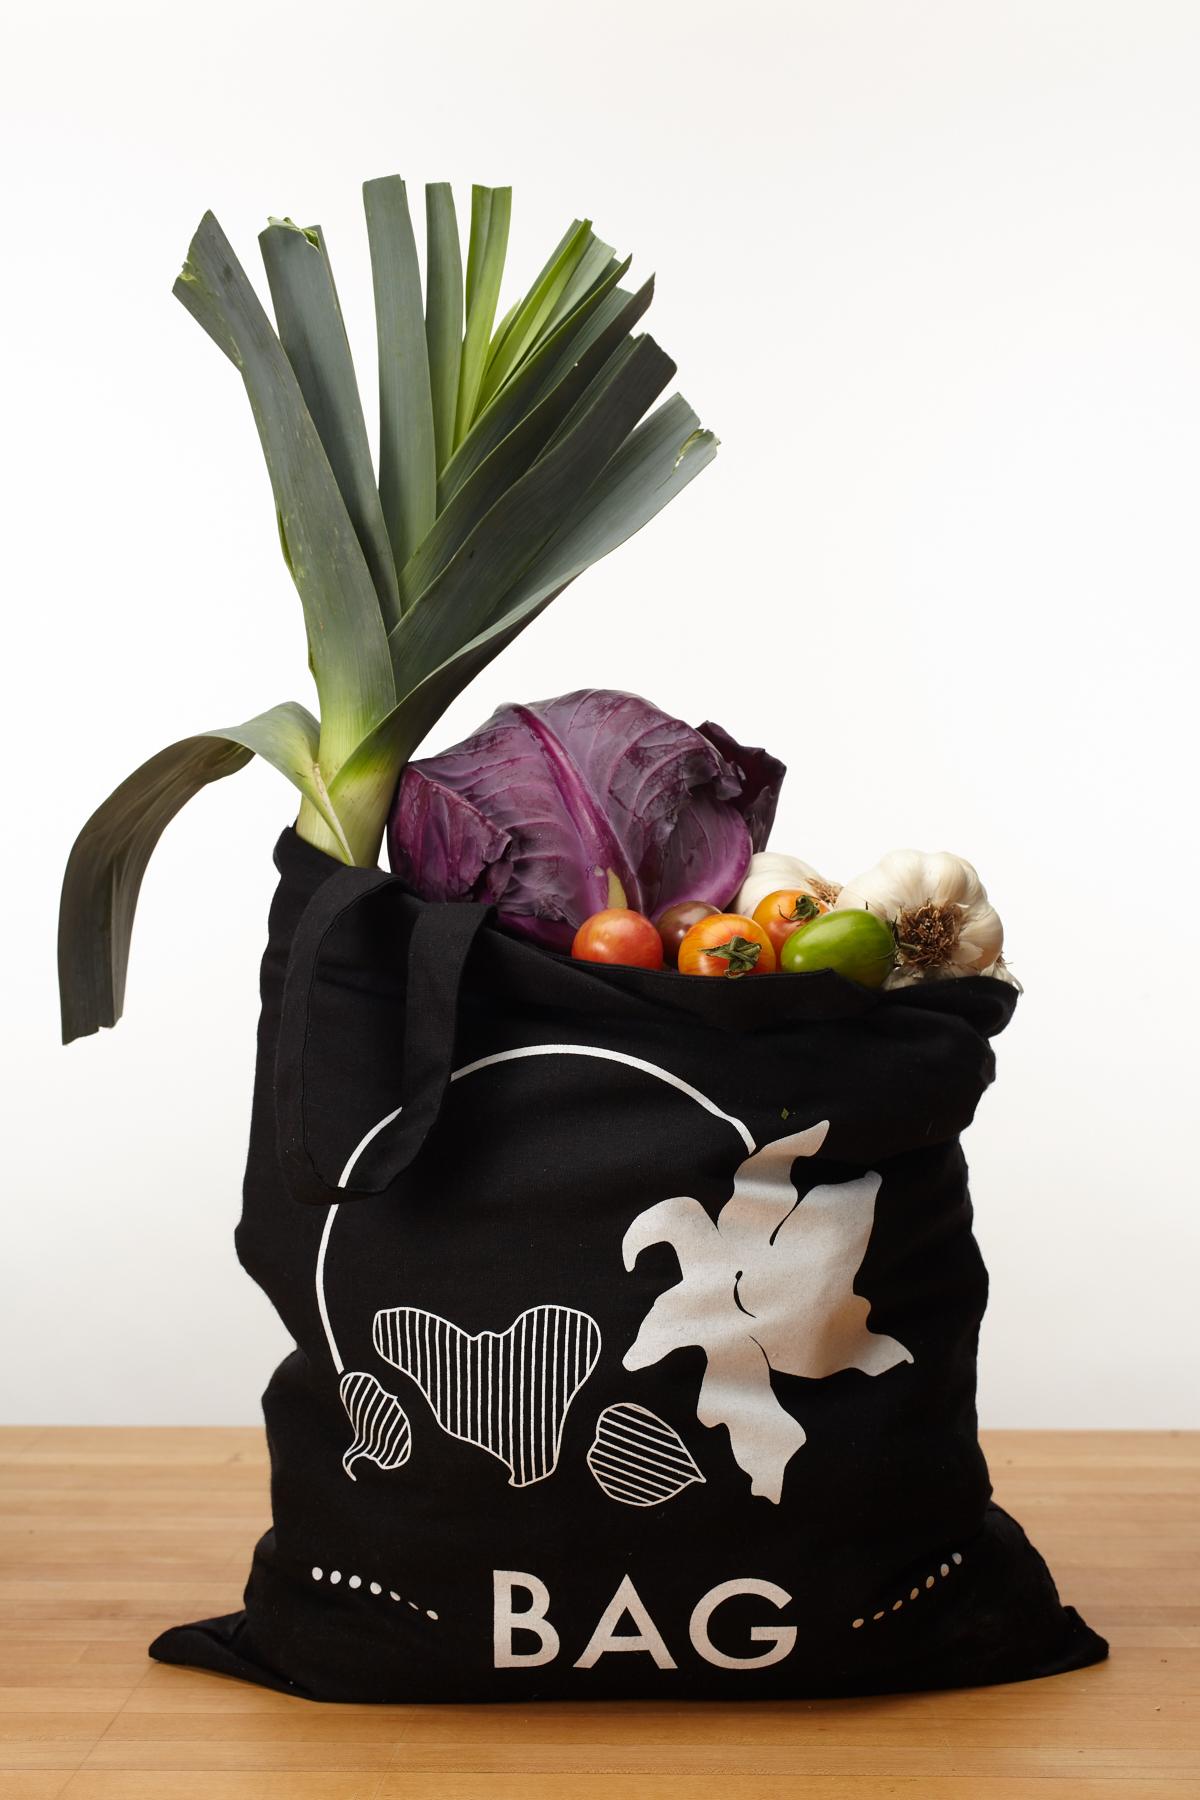 Blossom Bag. Image by Byron Flesher